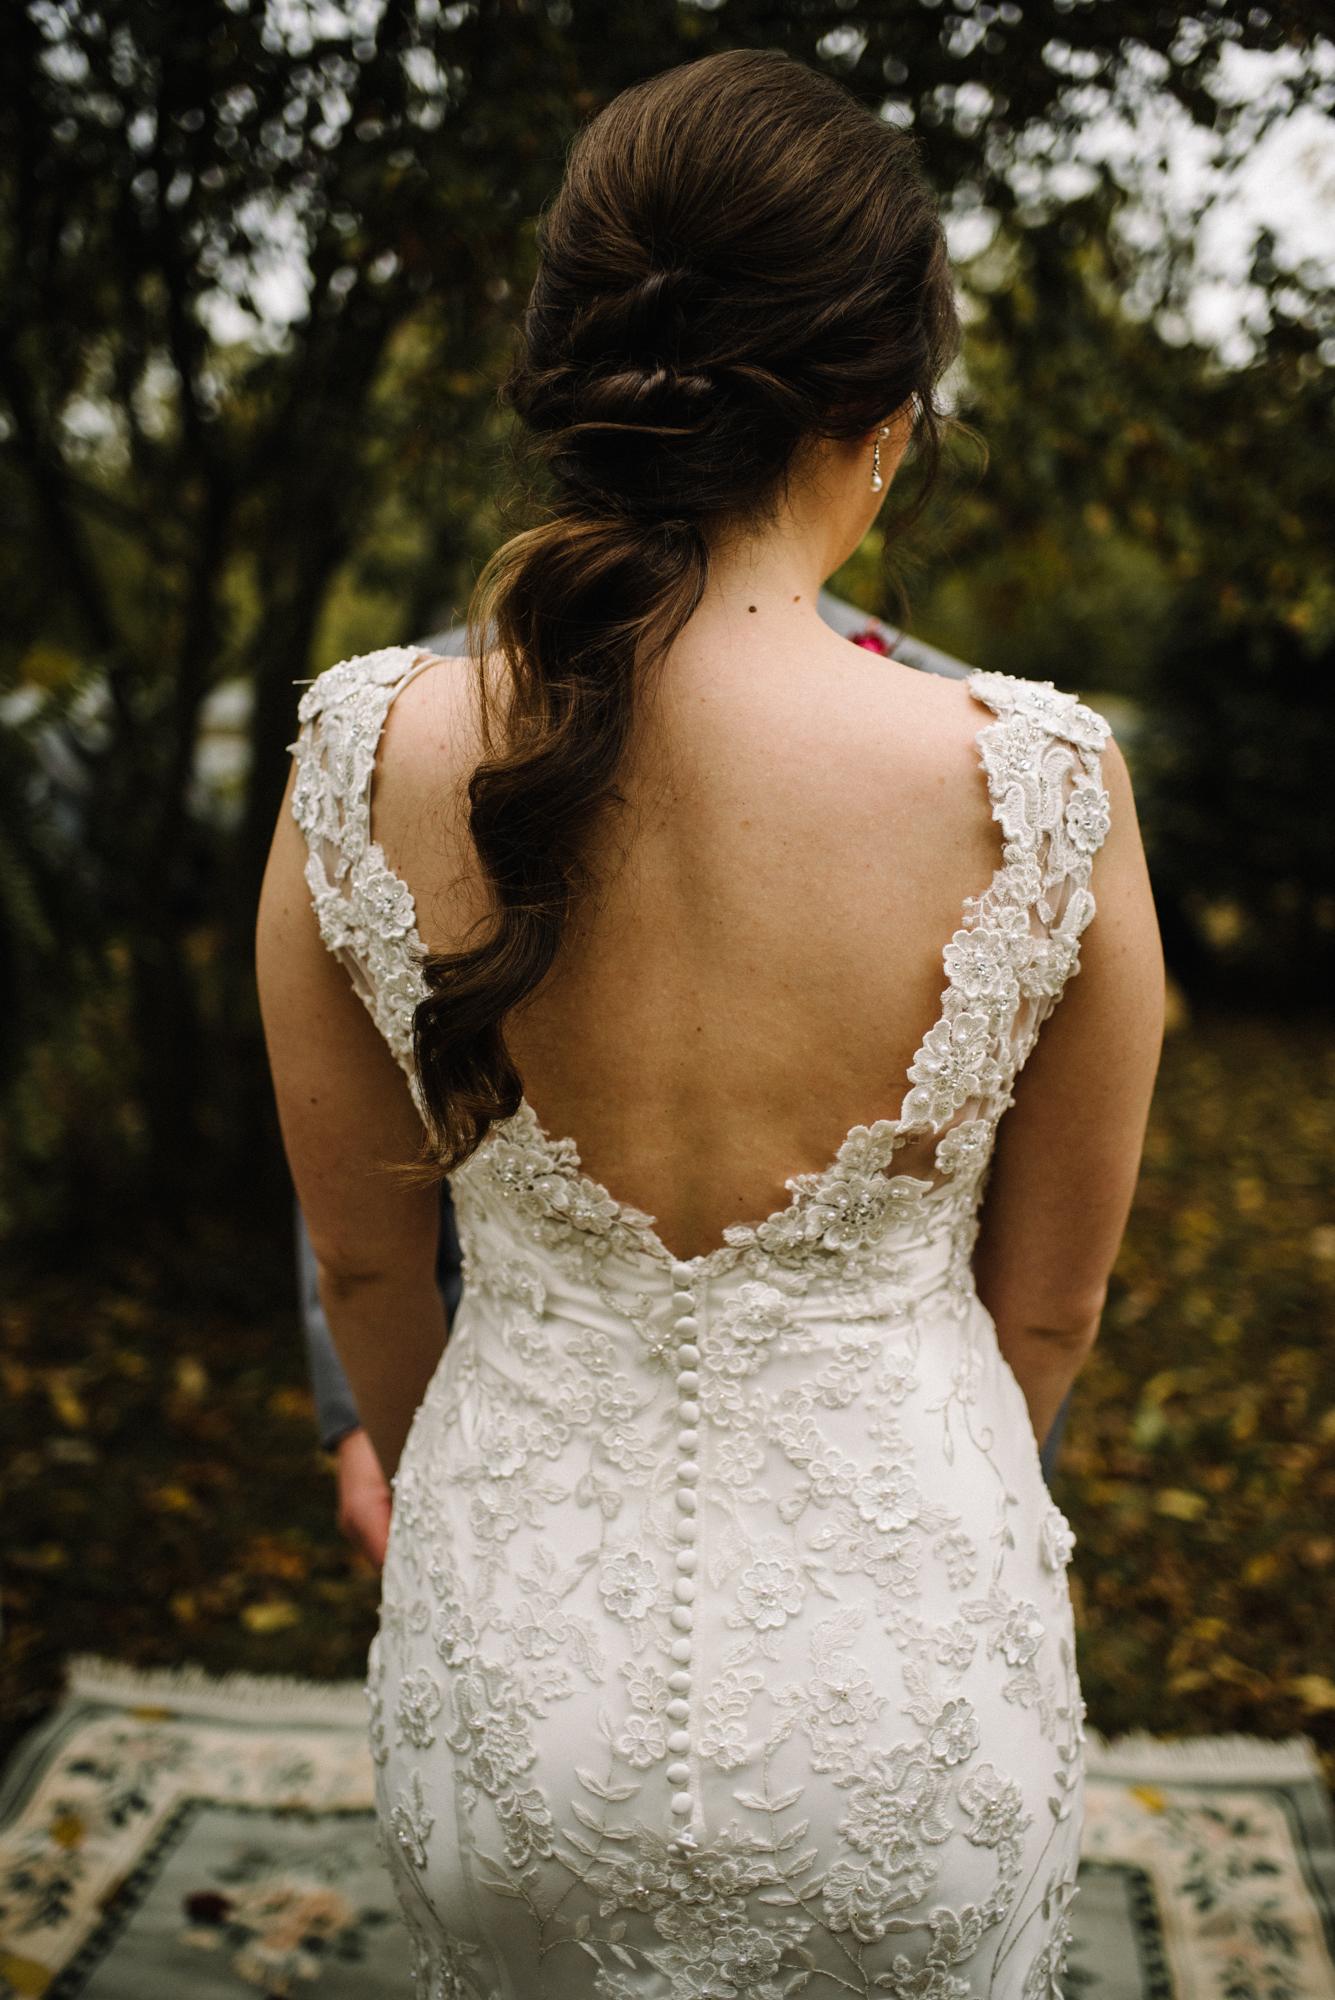 Mandi-and-Jordan-Intimate-Backyard-River-Wedding-Shenandoah-Valley_31.JPG